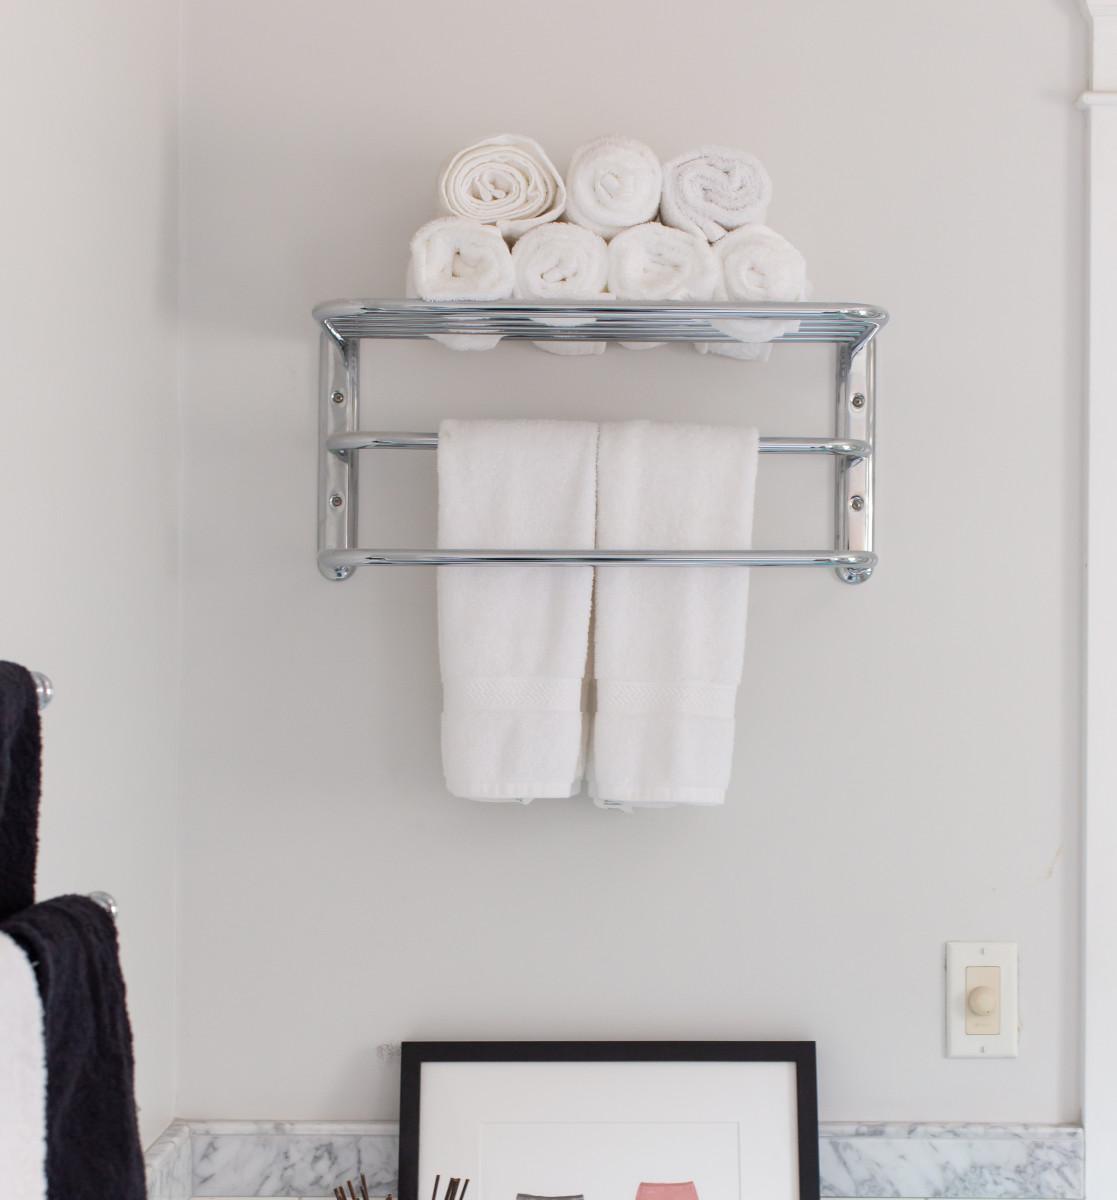 TowelsDiffuserPooDropsArtTissues3